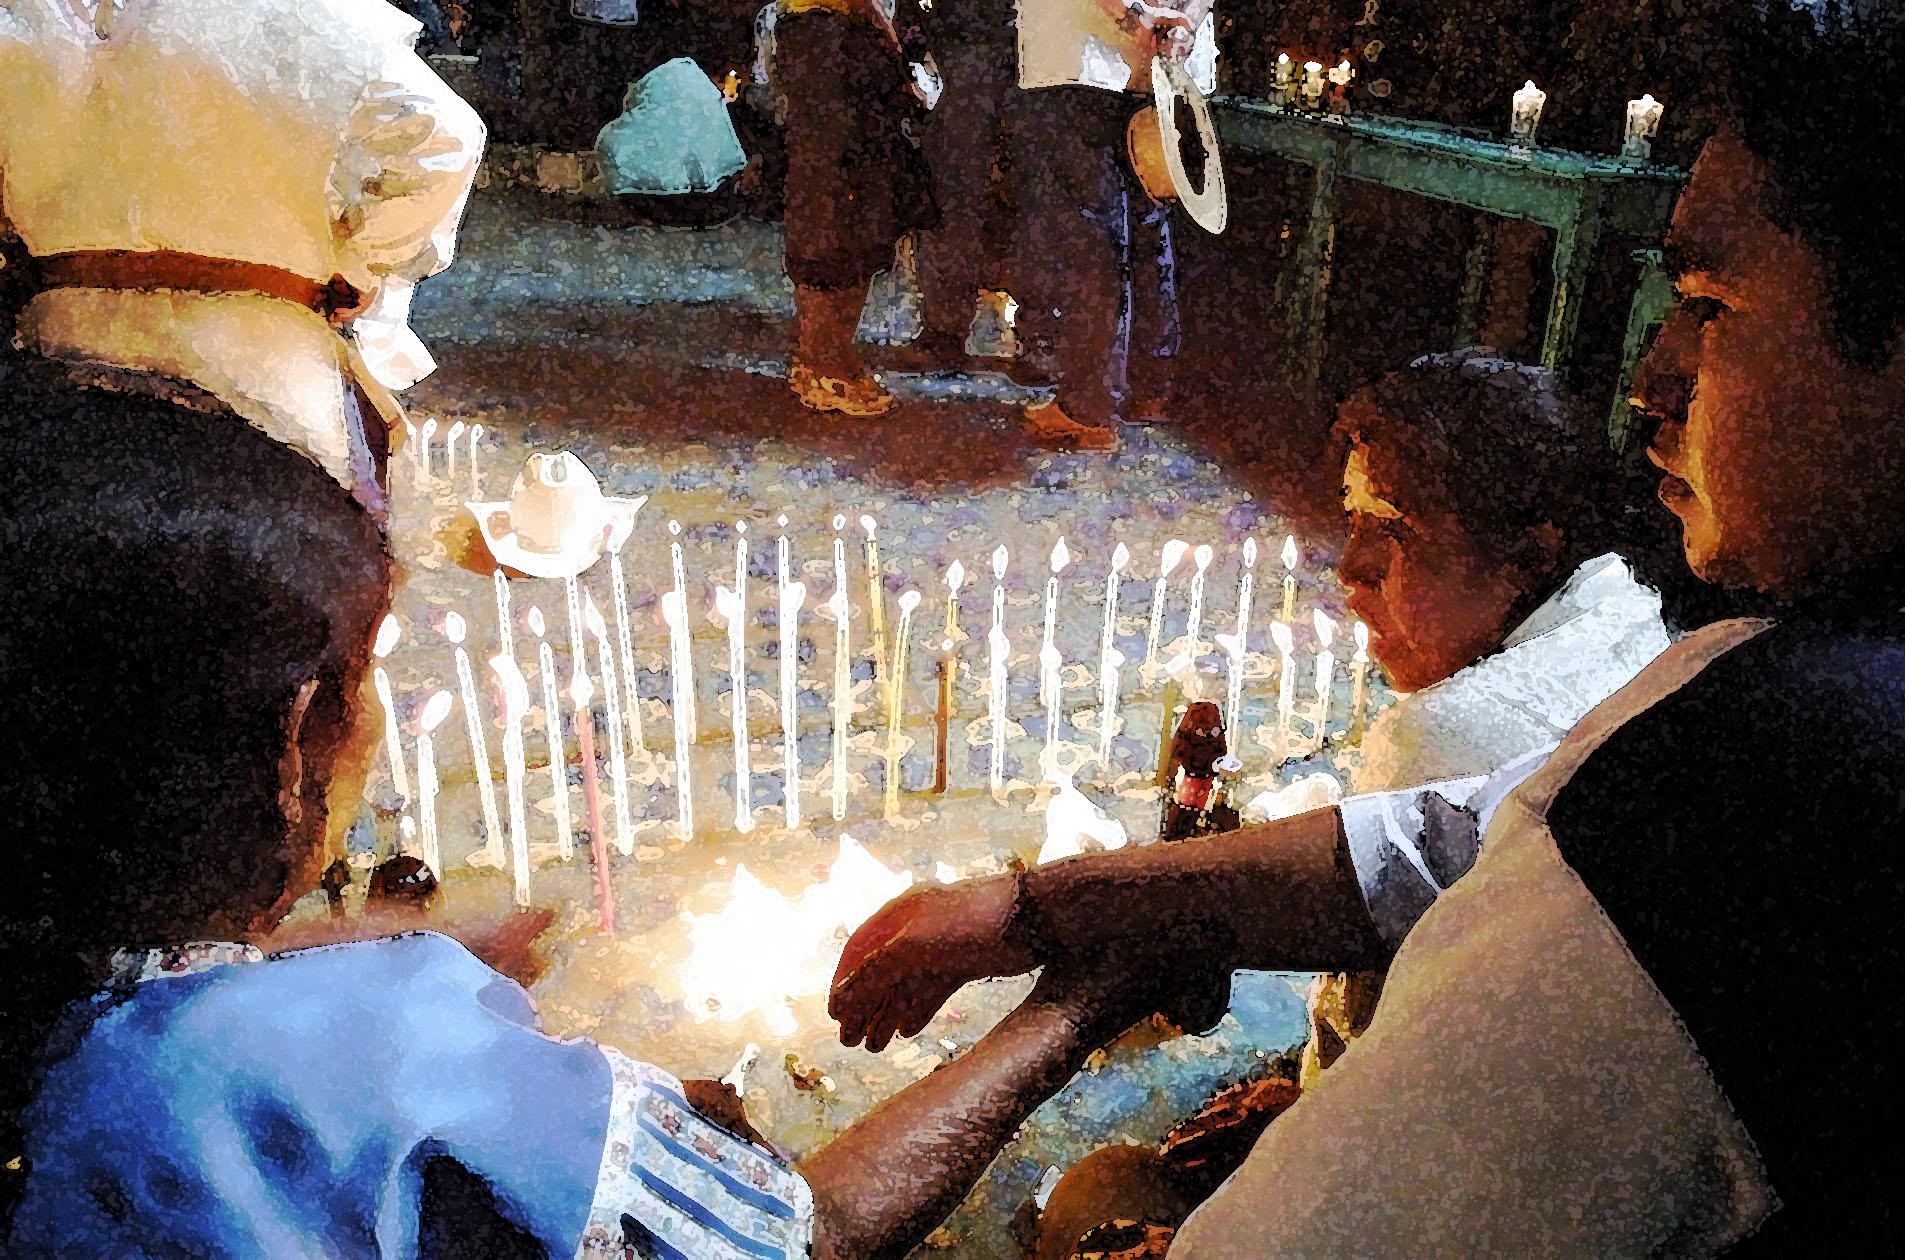 Ilol cures Chamula 2001